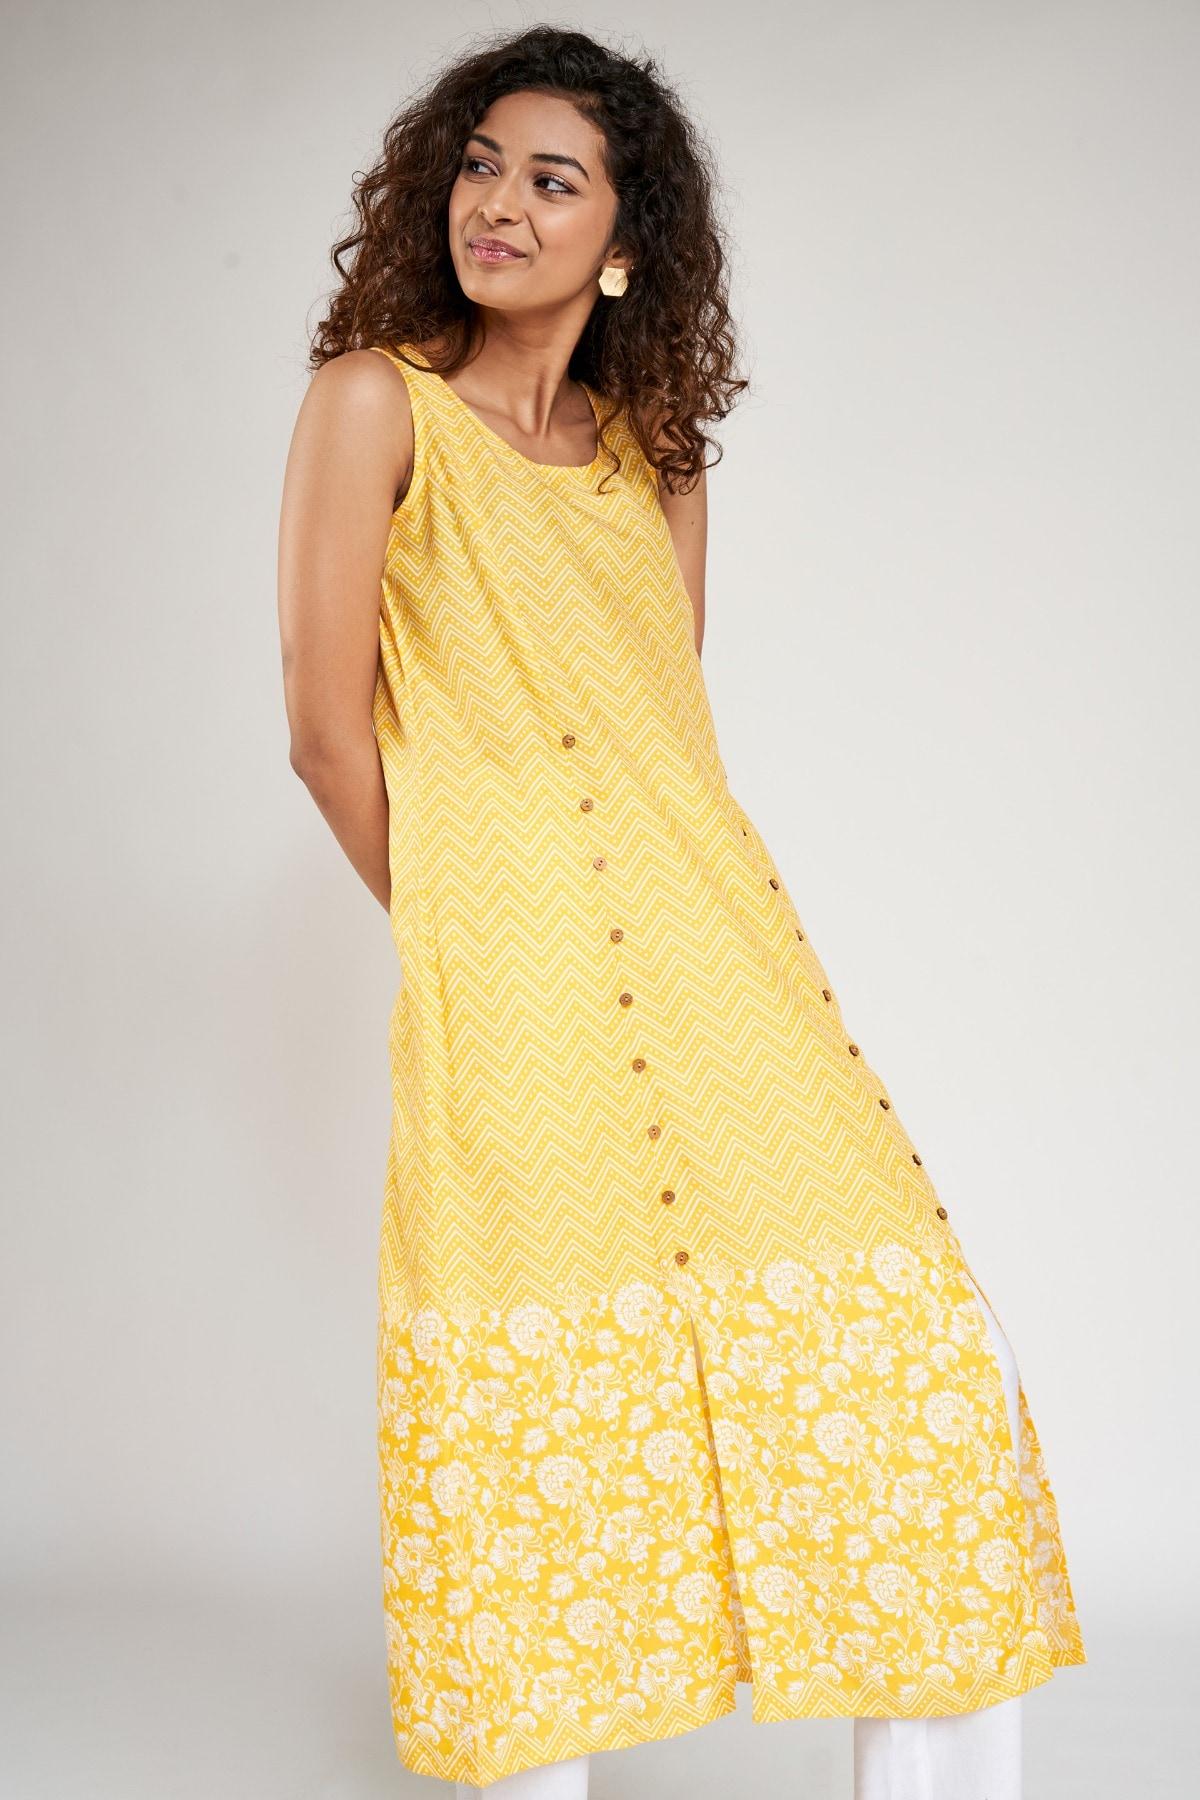 Global Desi | Yellow Floral Printed Kurta